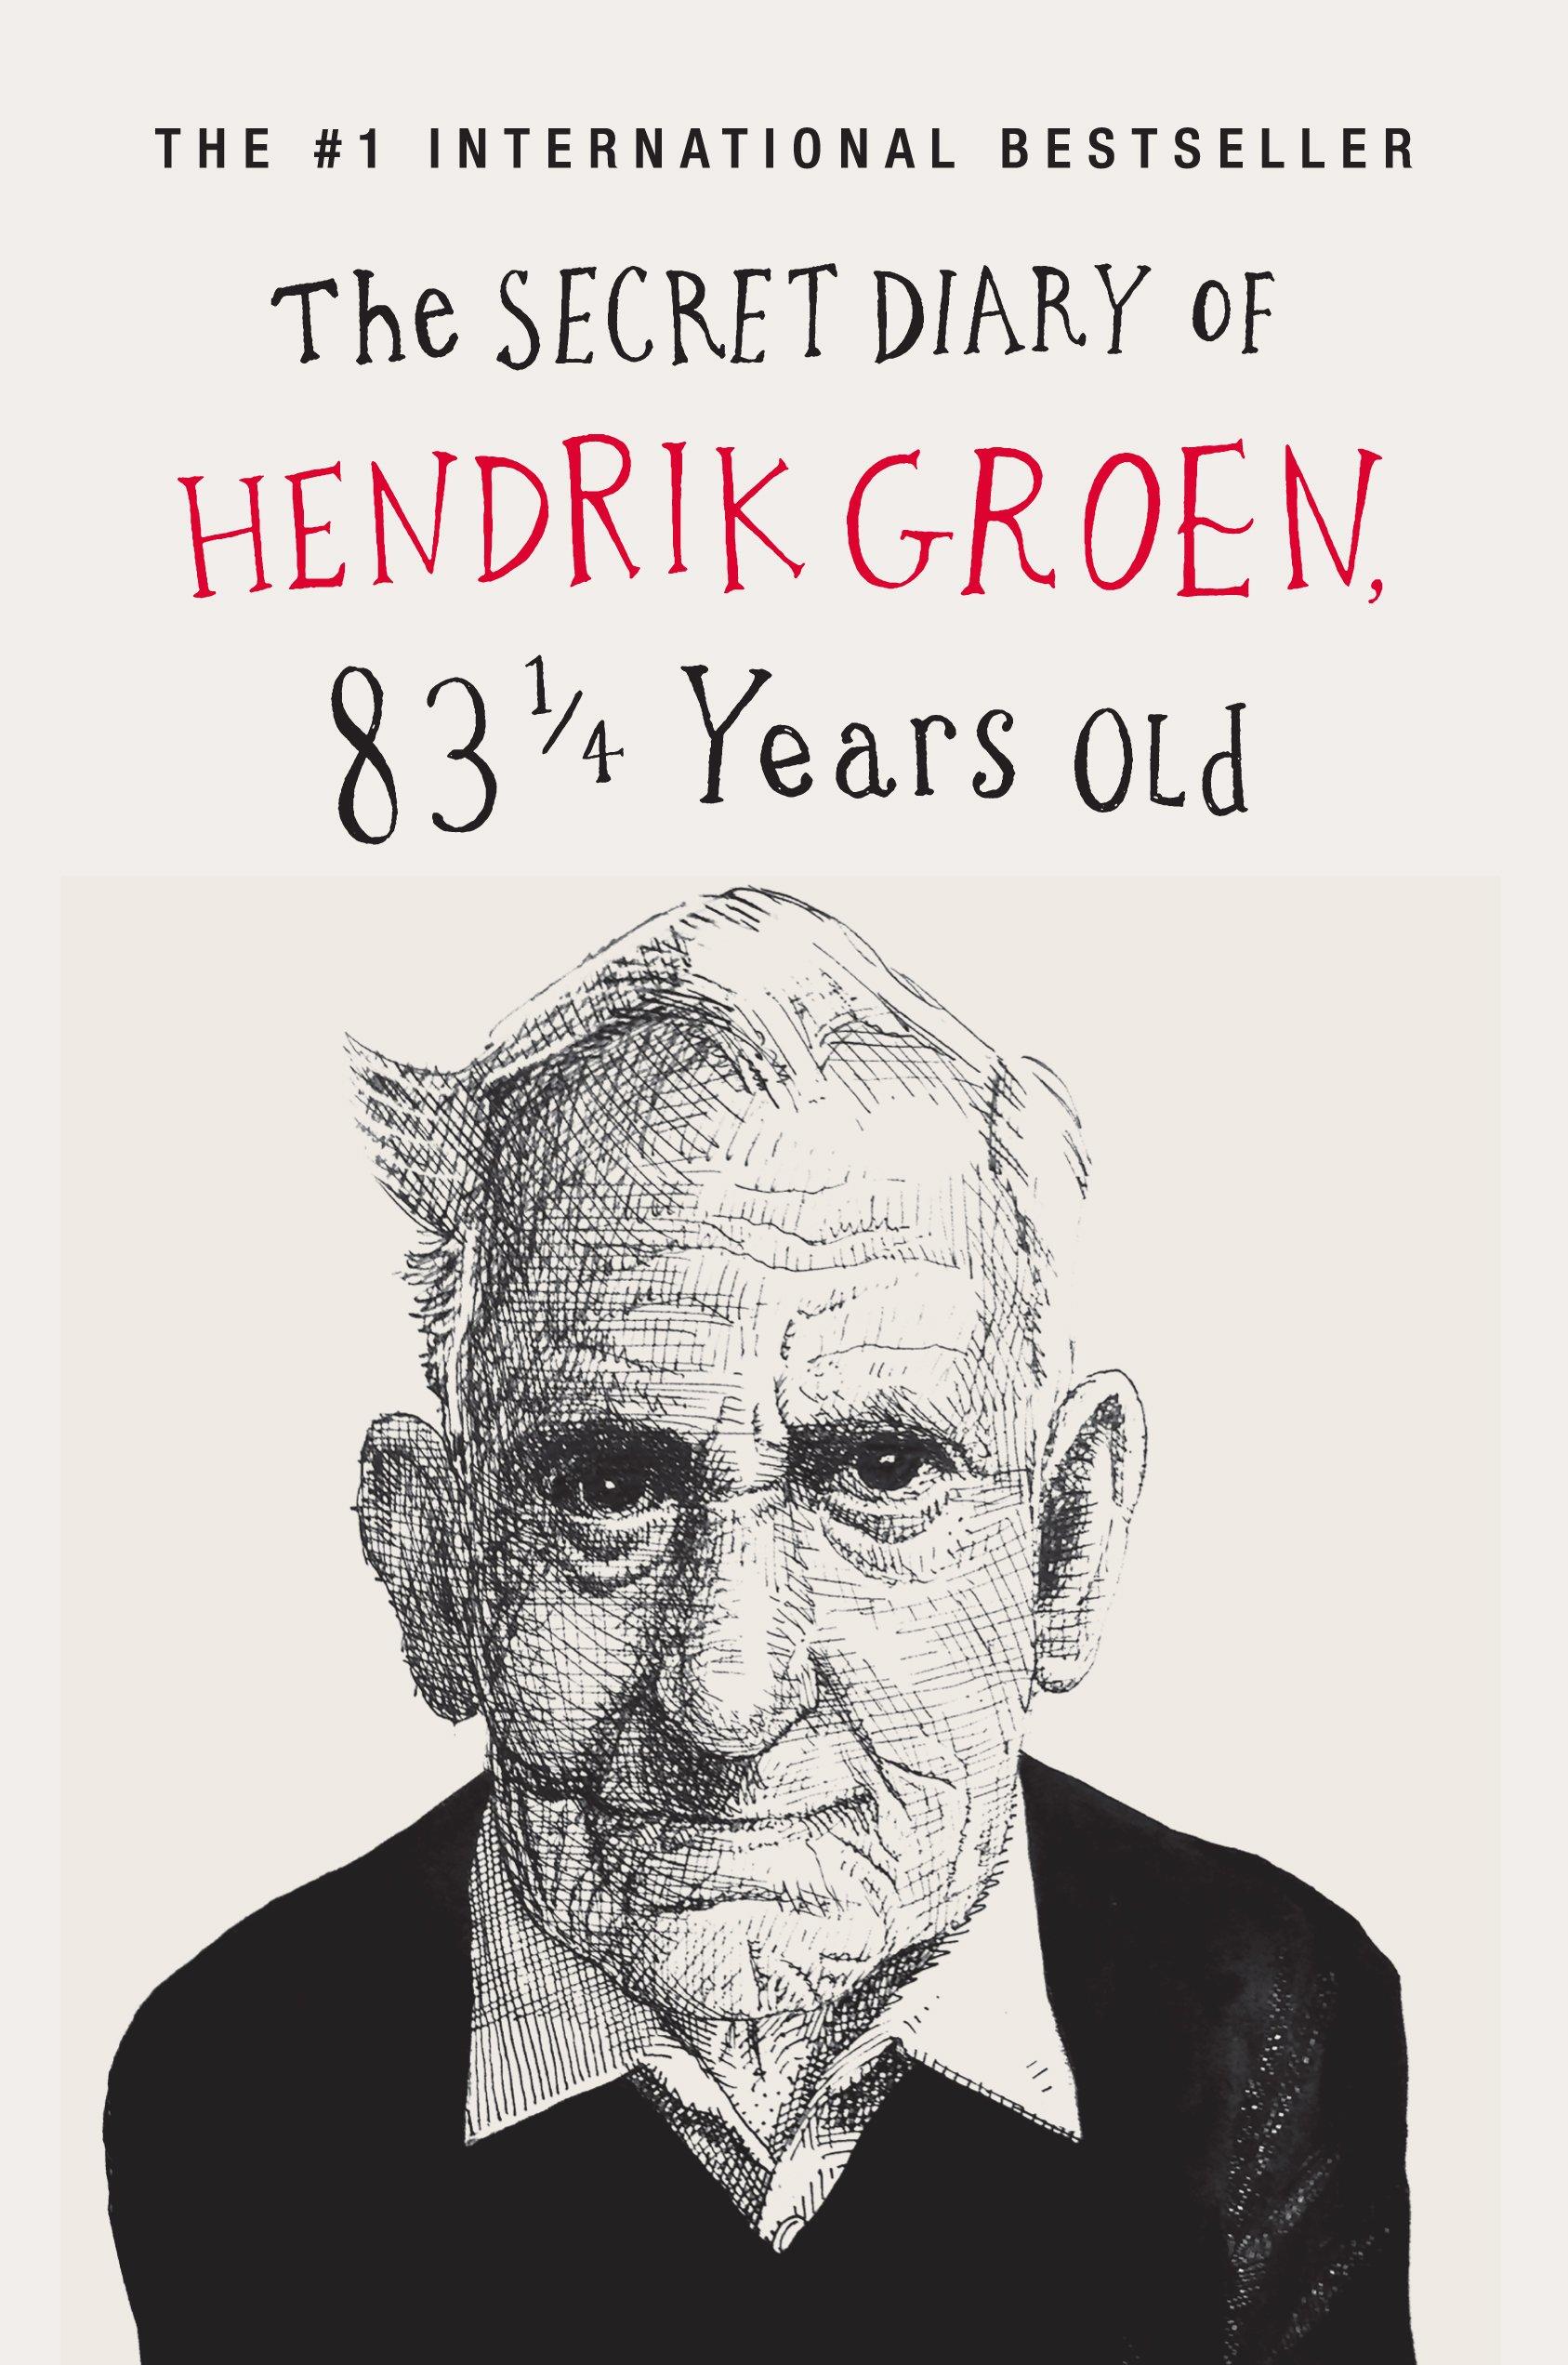 The Secret Diary of Hendrik Groen: 83 1/4 Years Old (Thorndike Press Large Print Bill's Bookshelf)